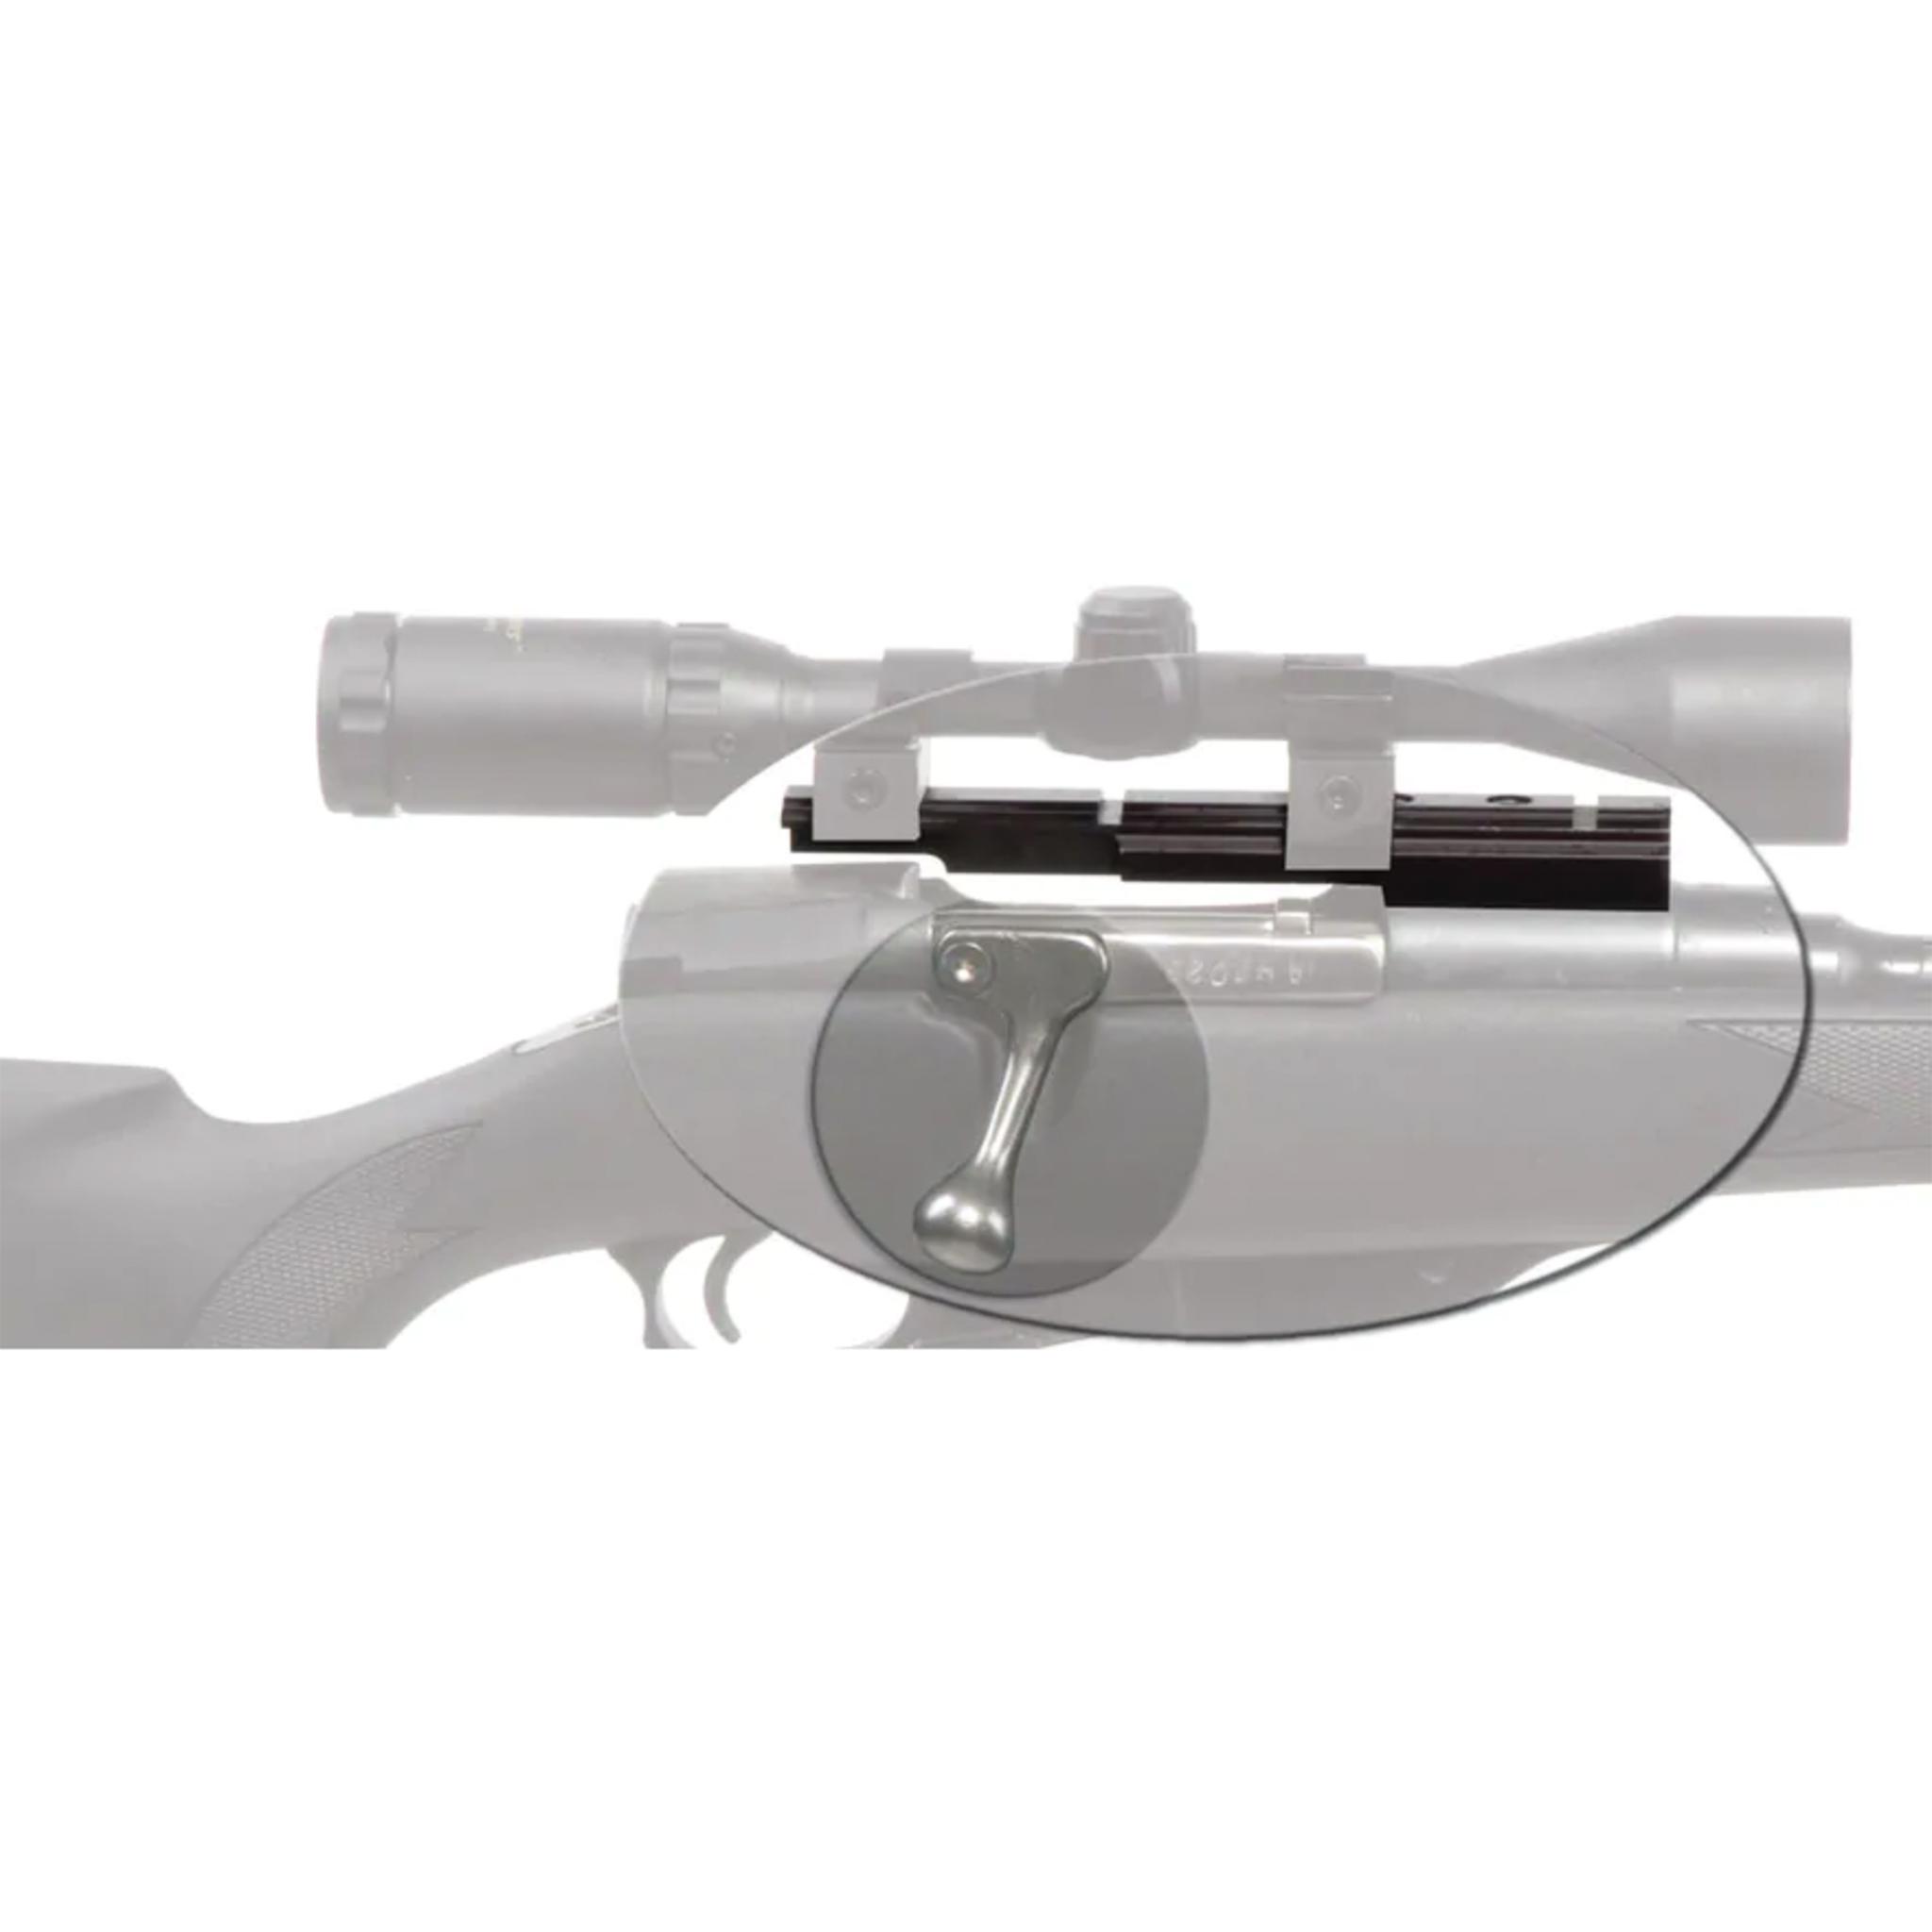 Advanced Technology International ATI Mosin Nagant Scope Mount & Bolt Handle 7.62x54R